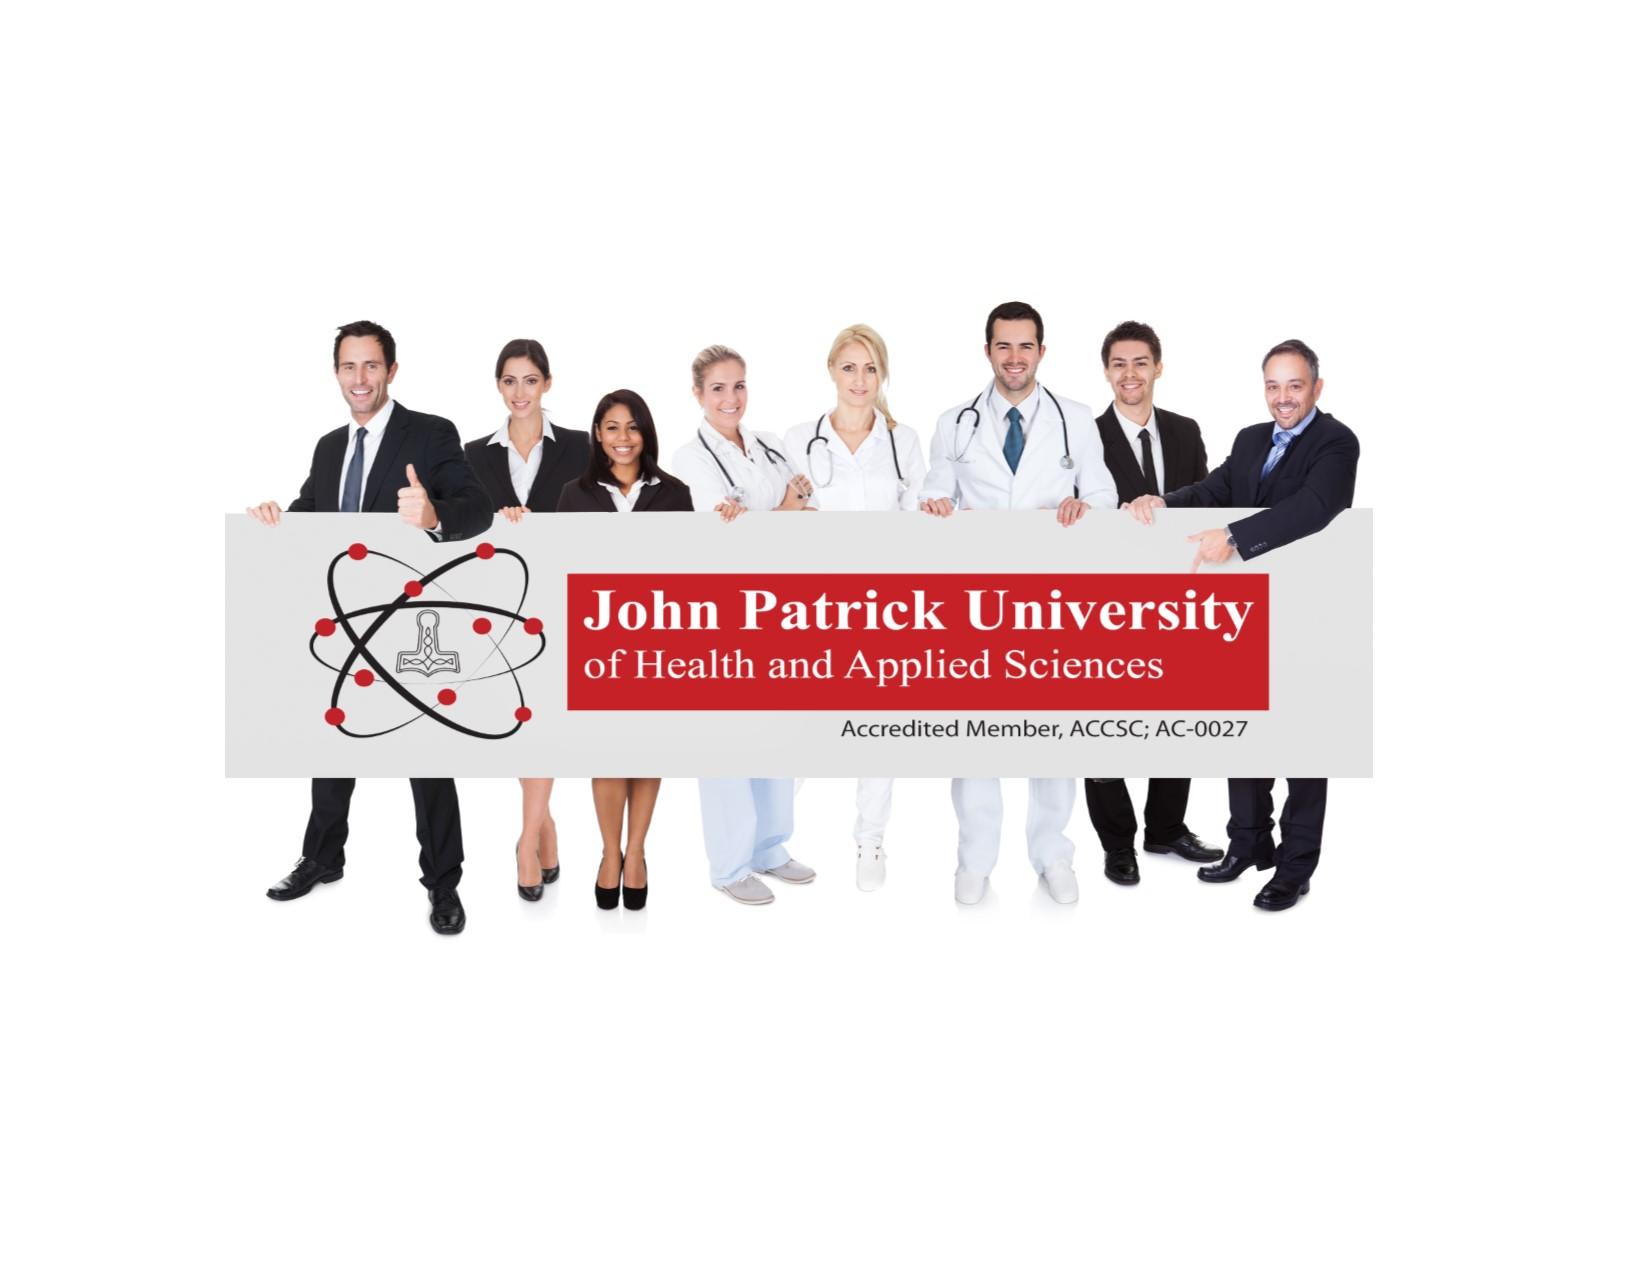 School of Business and Informatics